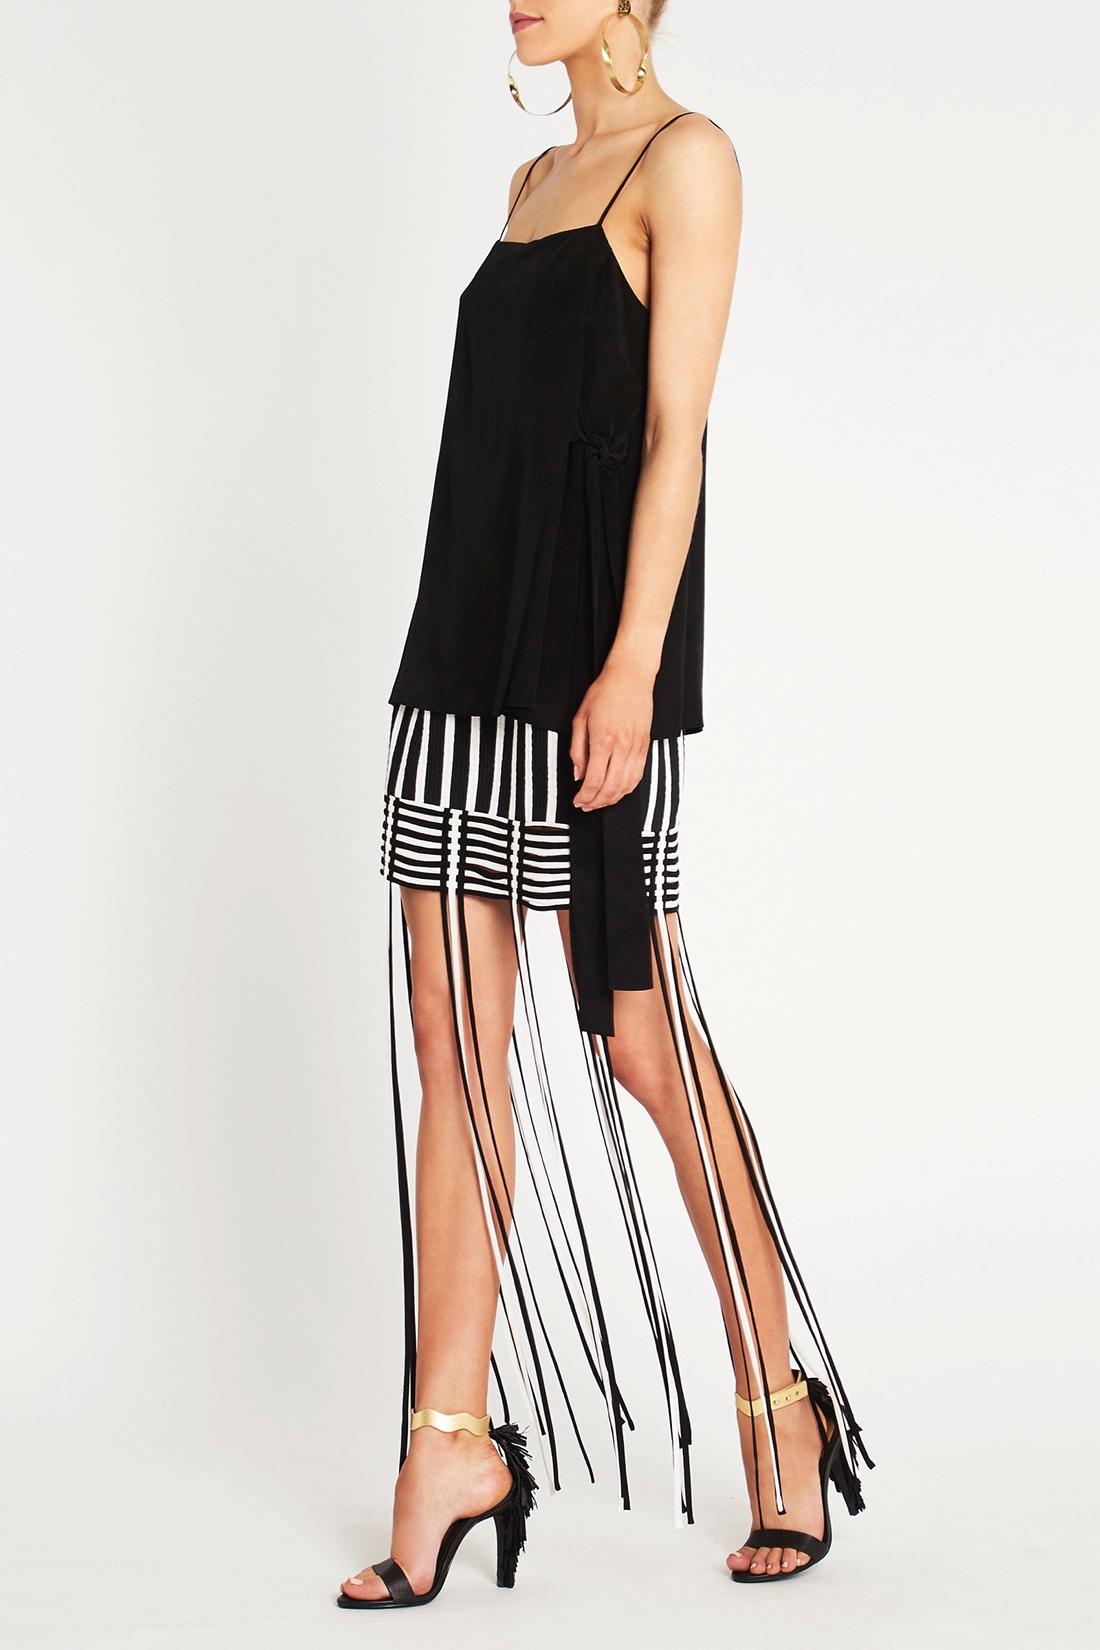 new salute skirt_f3r17010_stripe-536